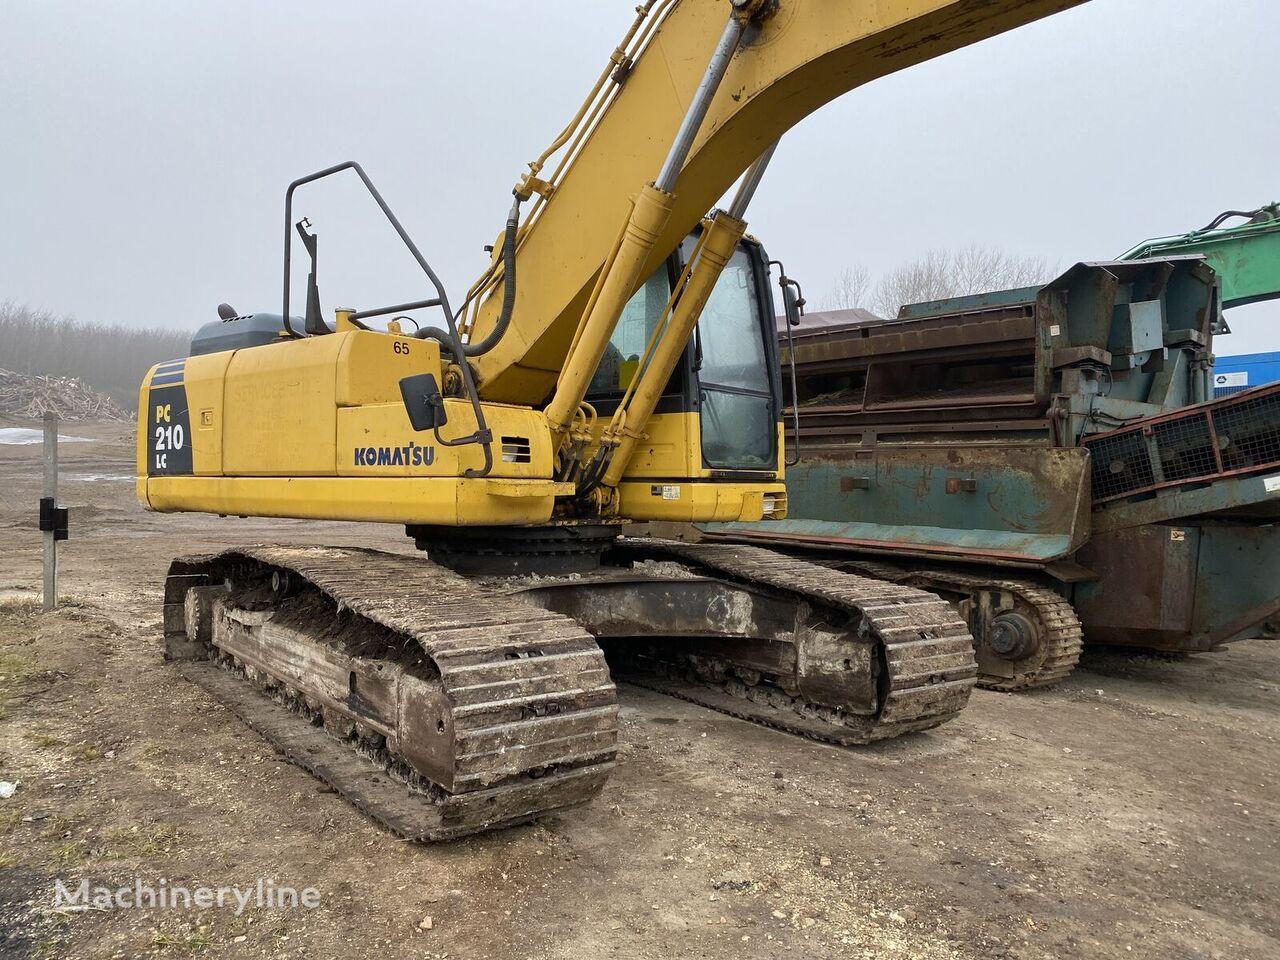 KOMATSU Pc210 demolition excavator